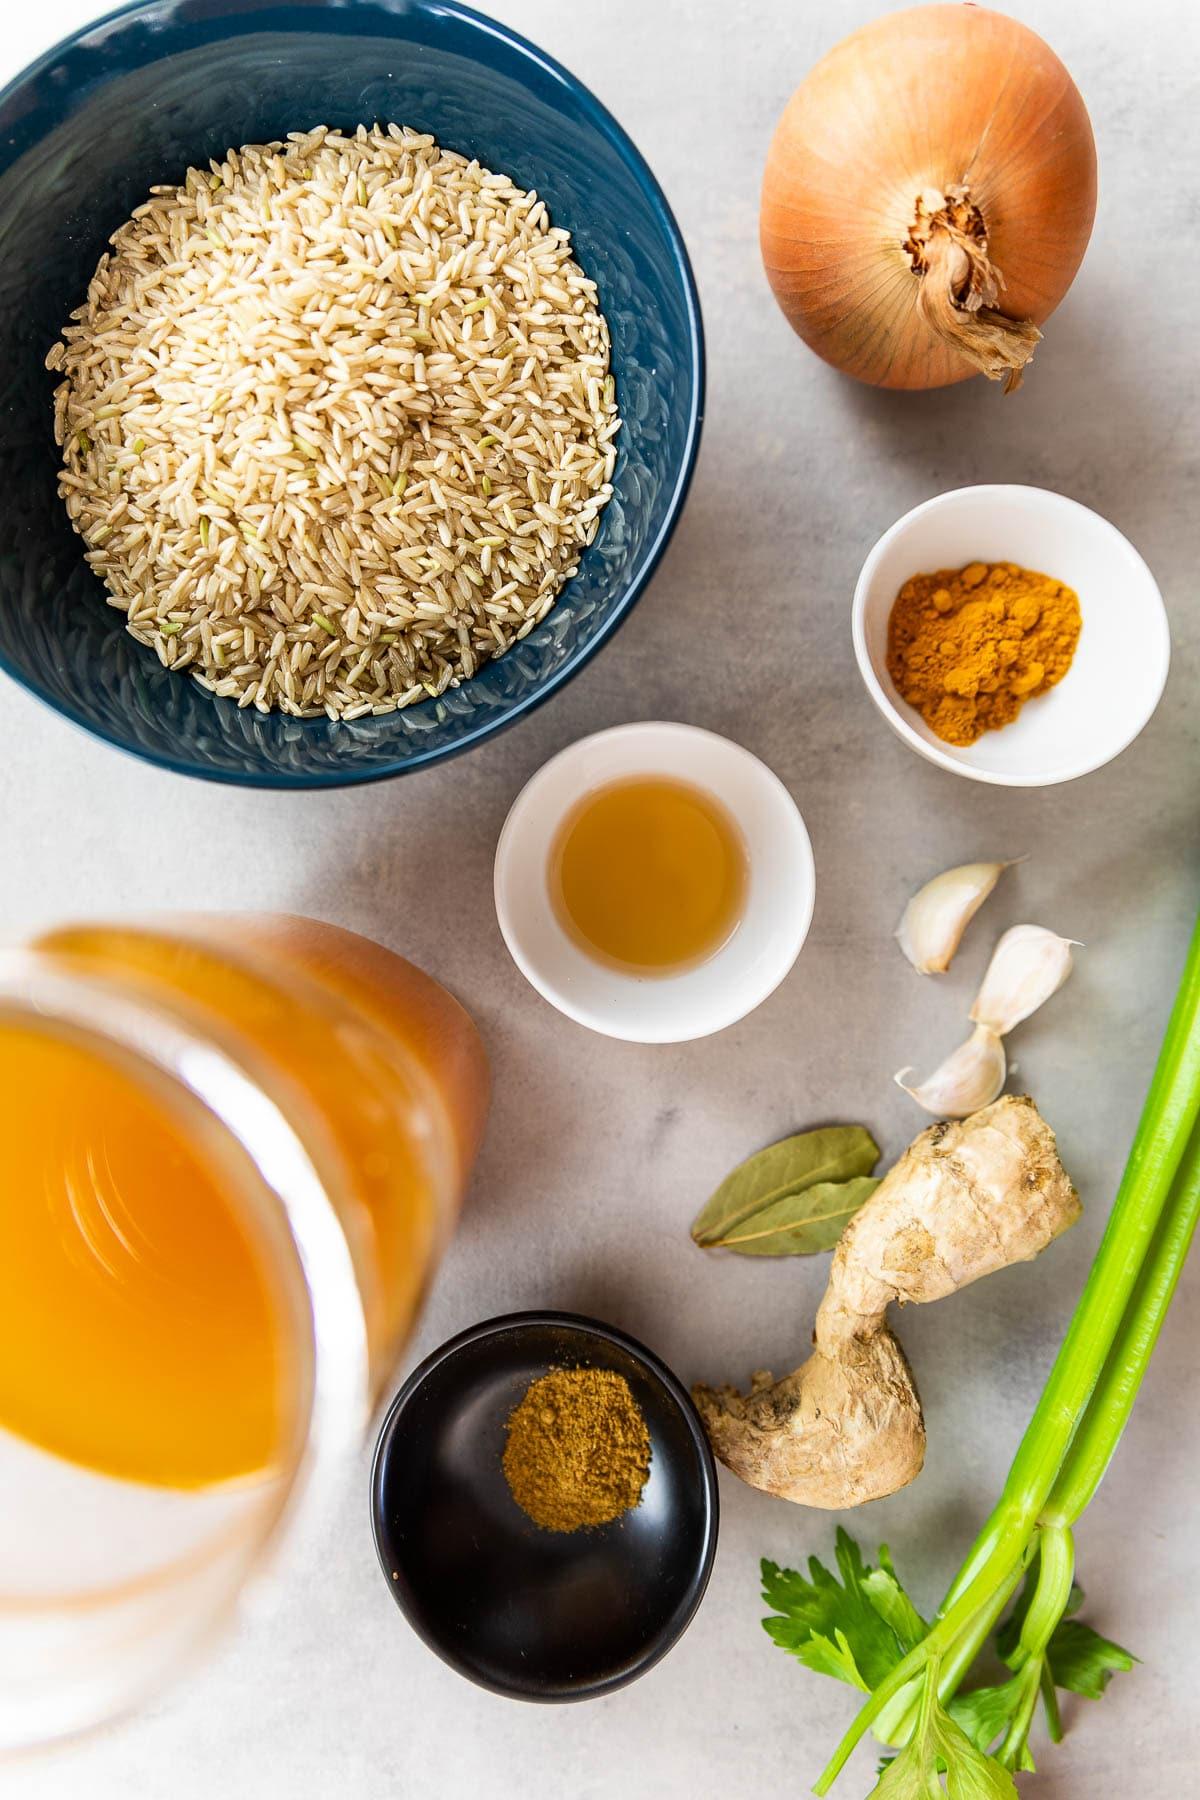 Ingredient shot for vegan turmeric rice.